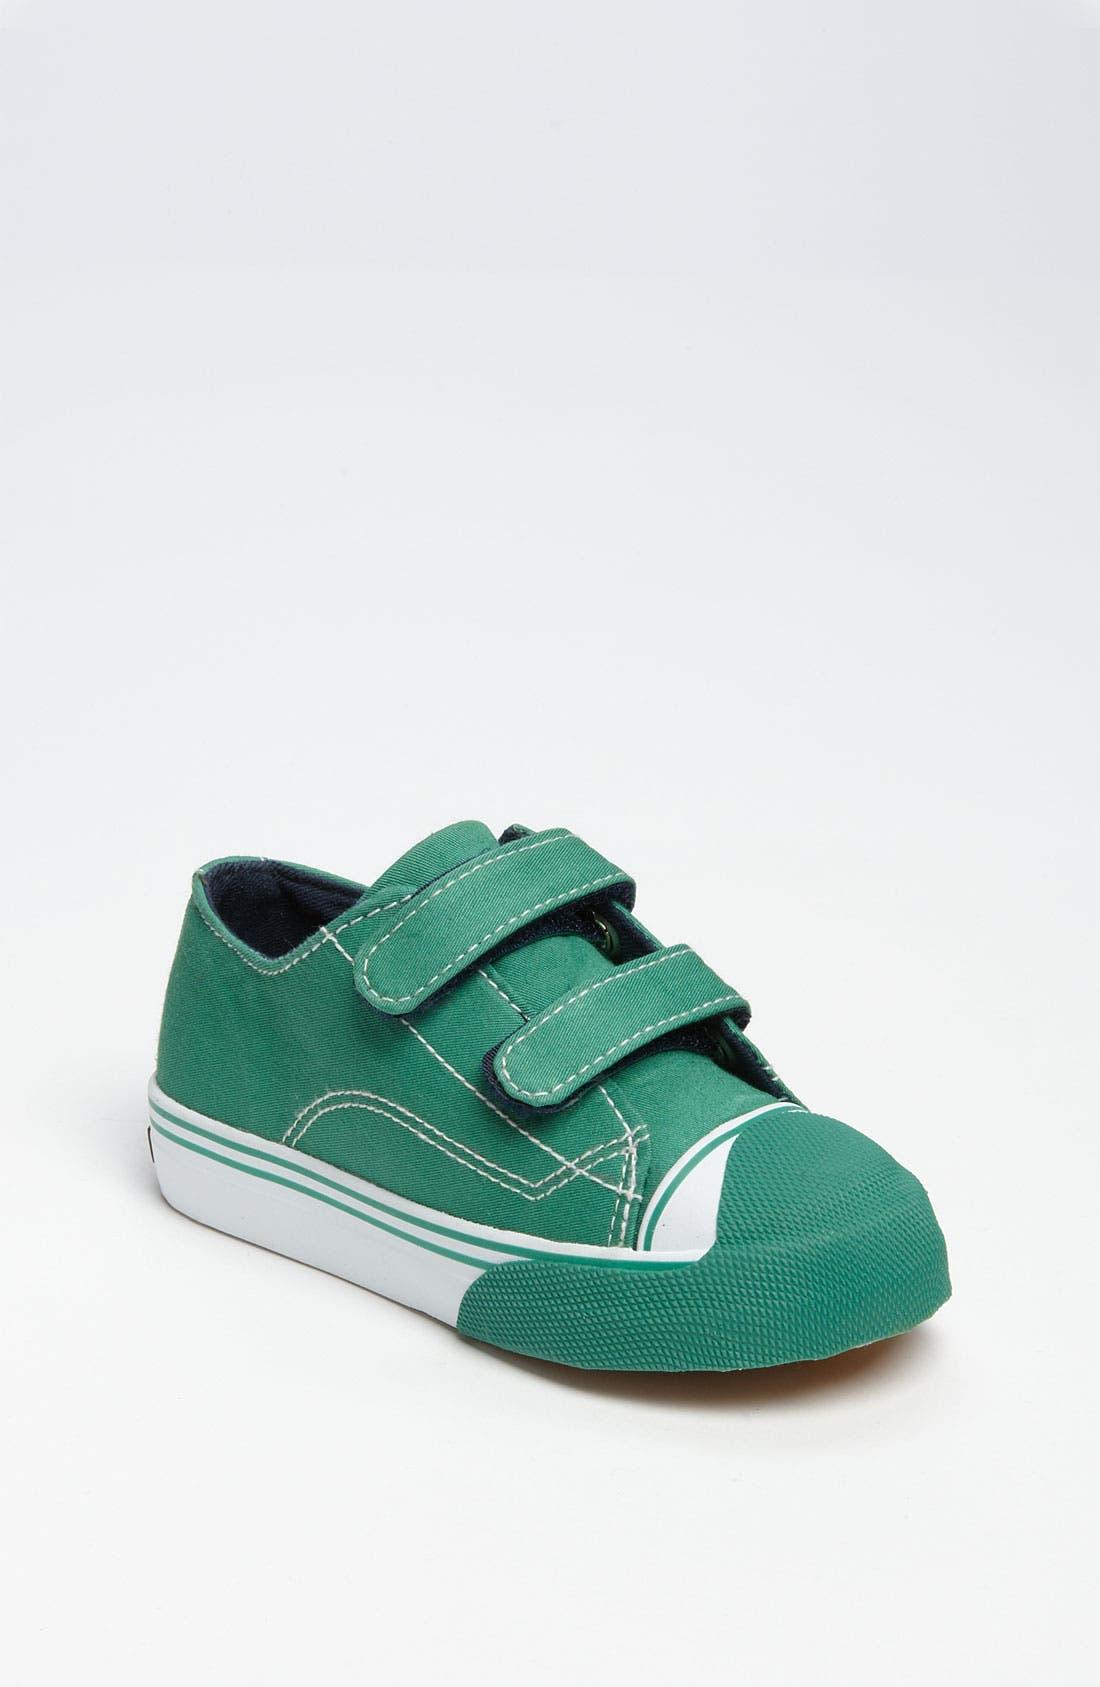 Alternate Image 1 Selected - Morgan & Milo 'Avery II' Sneaker (Walker & Toddler)